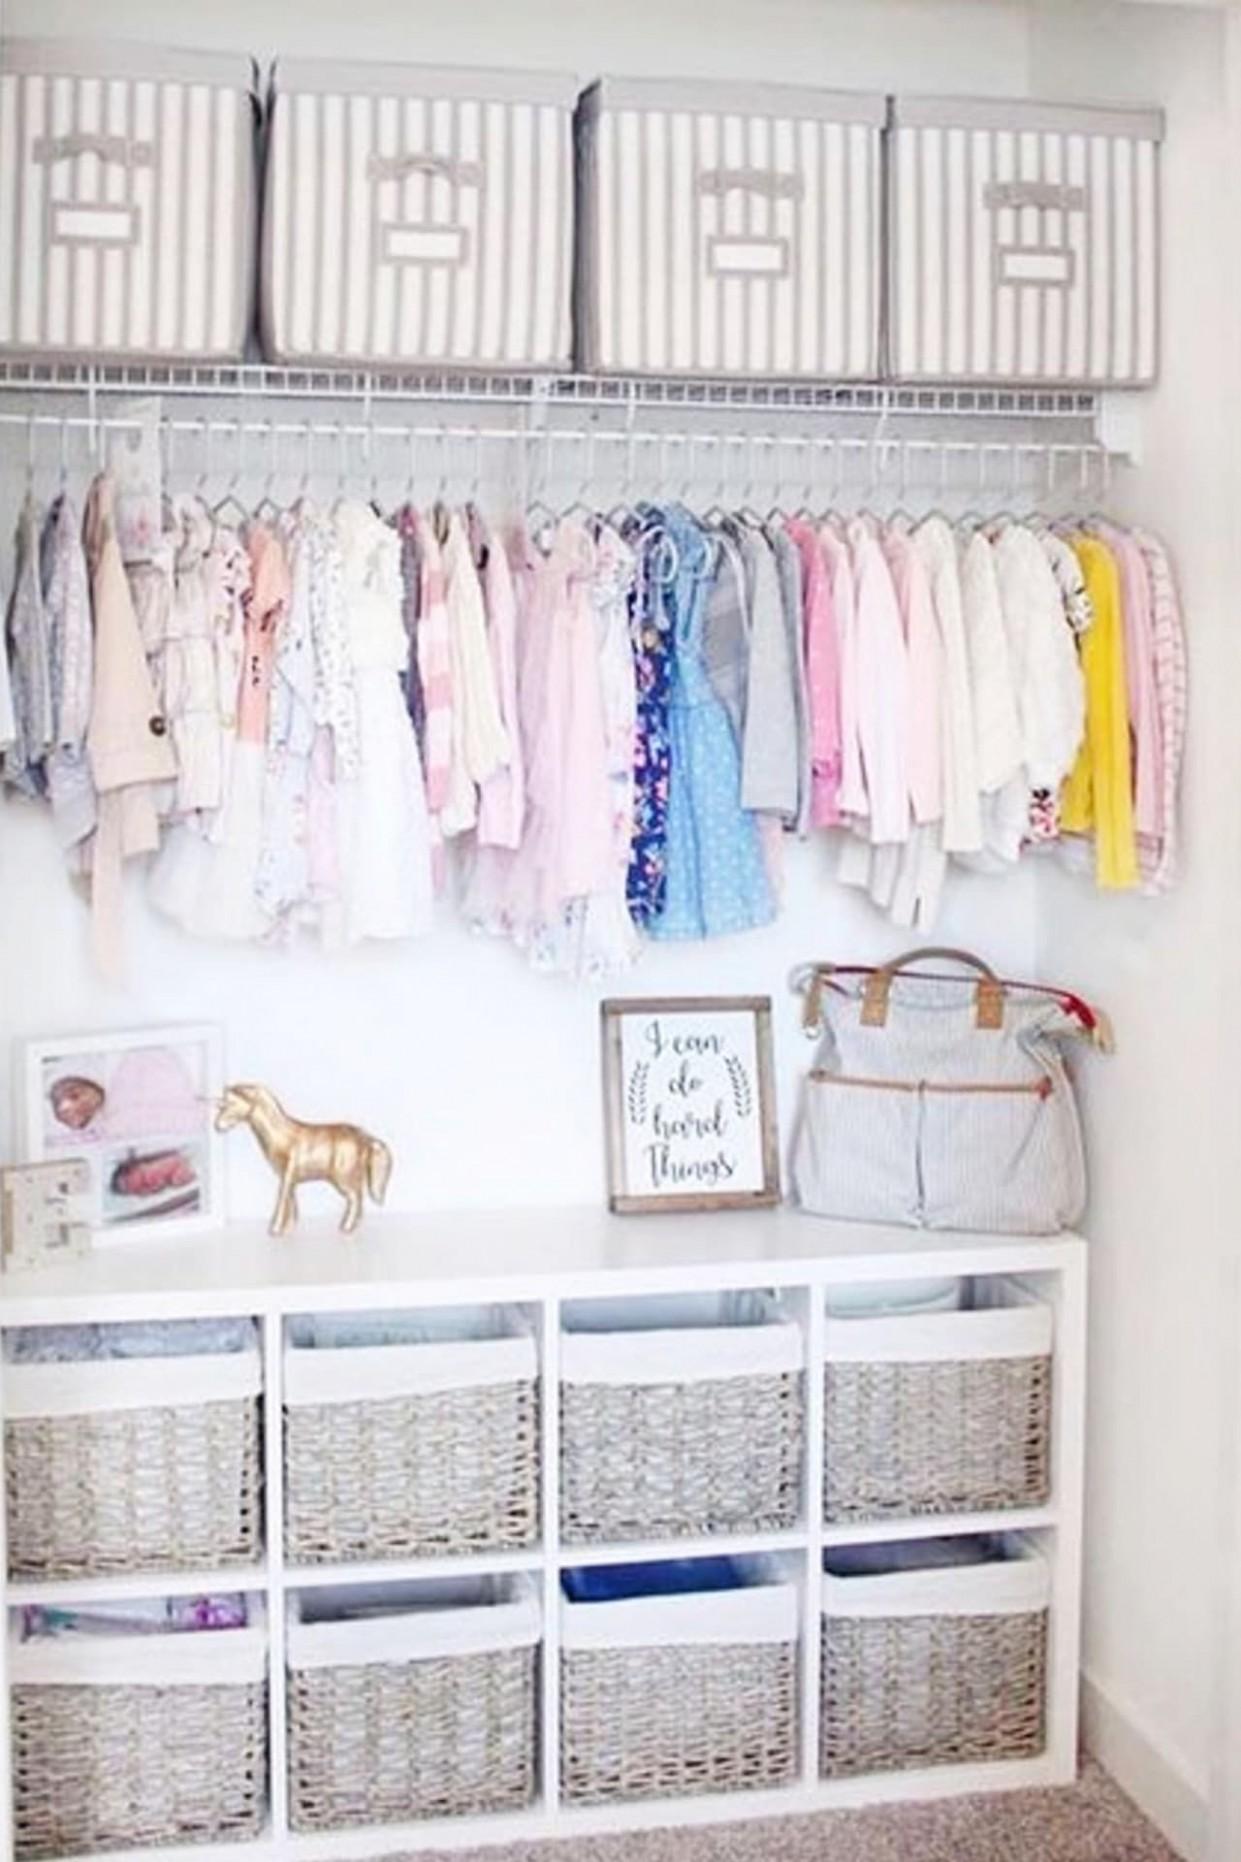 Baby Closet Ideas: 10 Nursery Closet Organization, Storage and  - Baby Room Storage Ideas